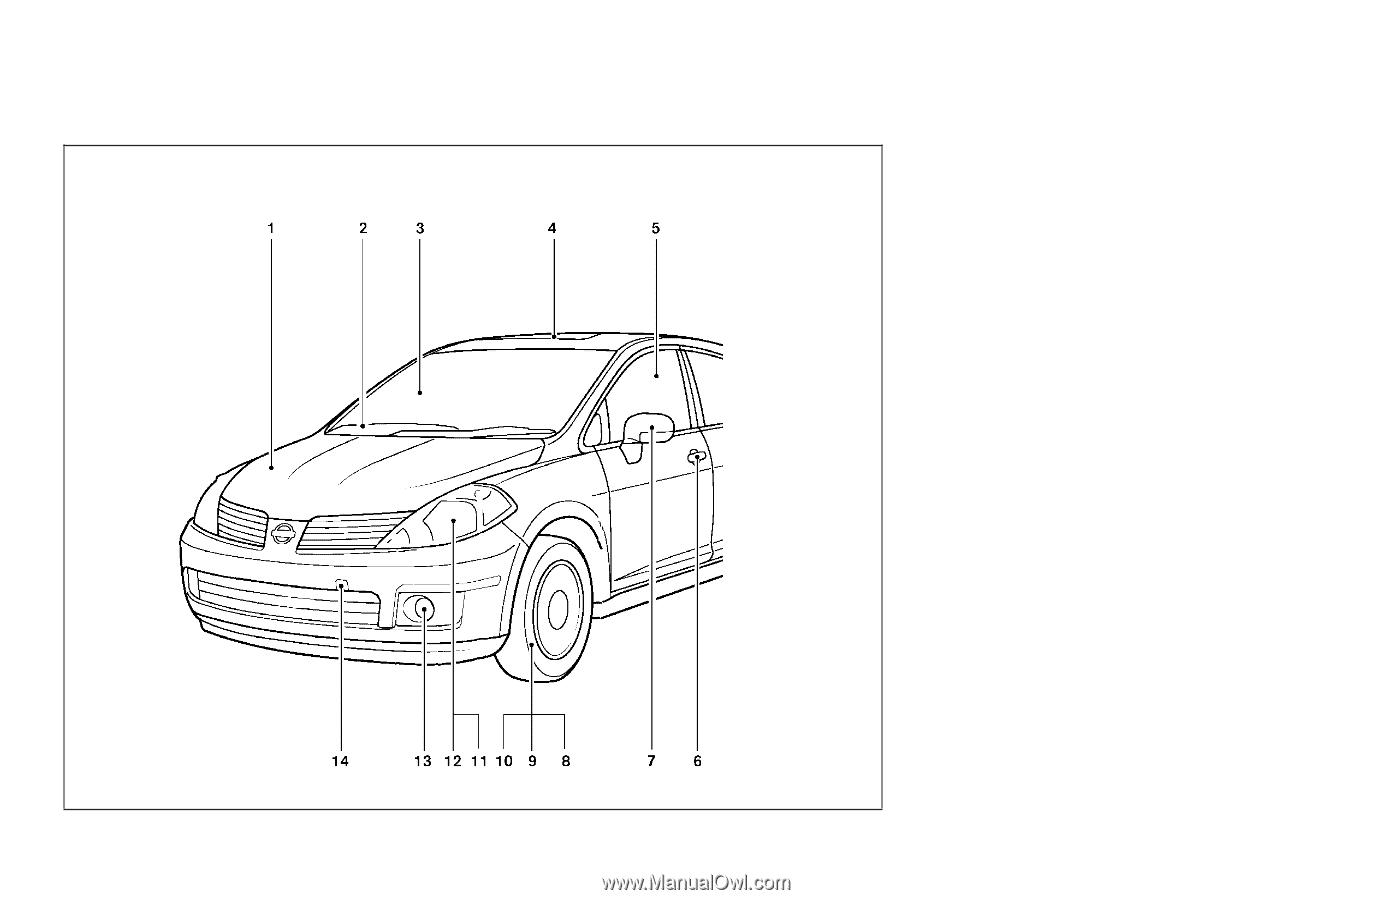 2007 Nissan Versa Owners Manual Hatchback Fuse Box 1